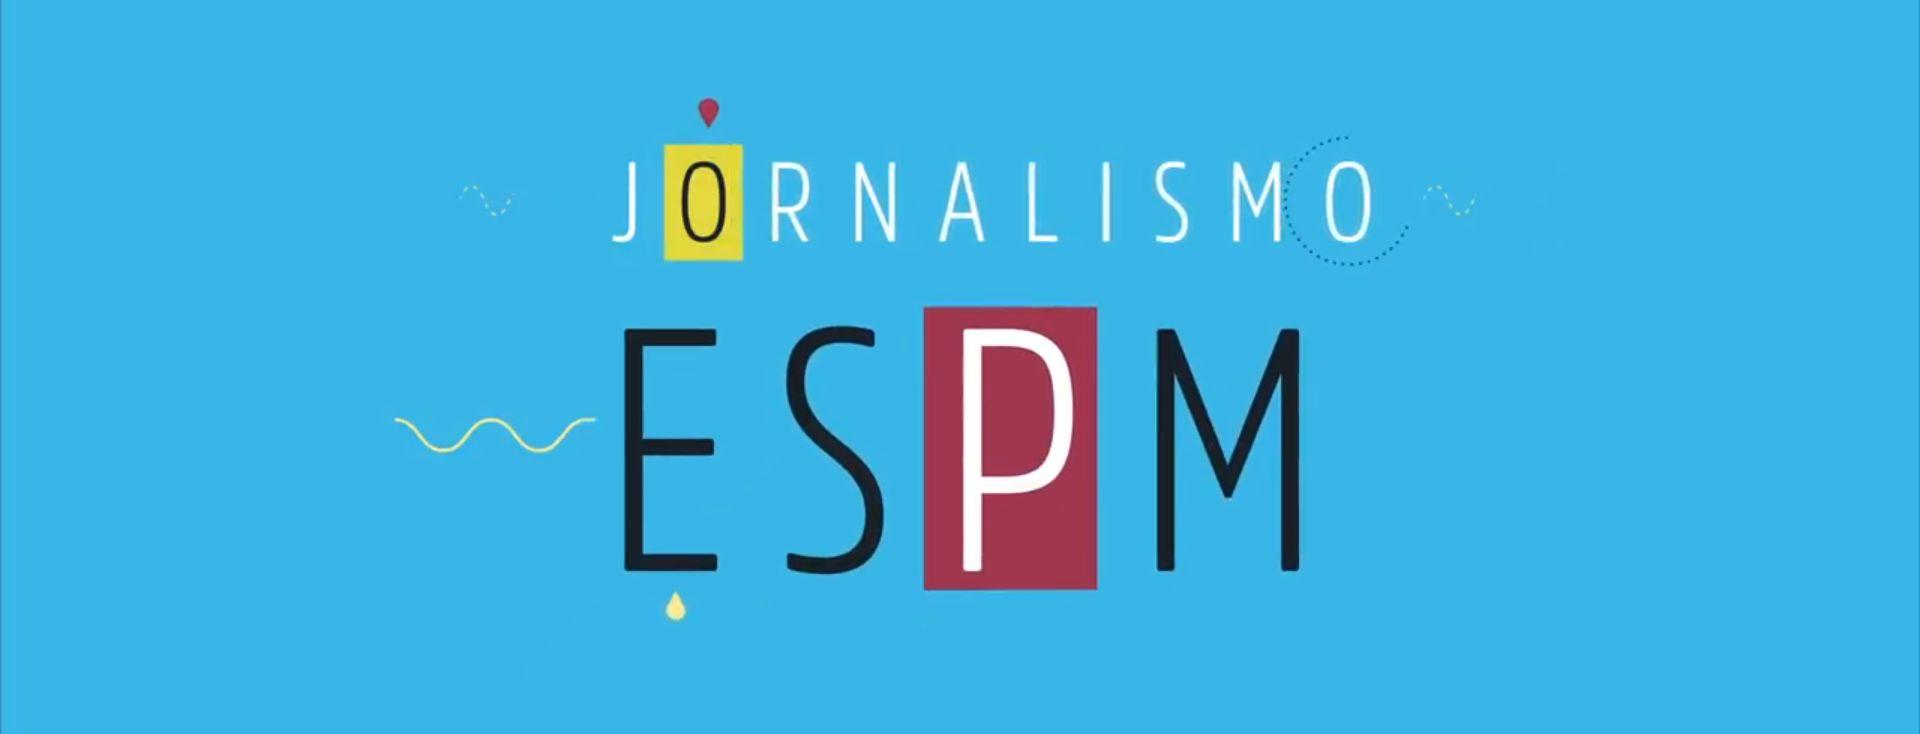 Jornalismo ESPM